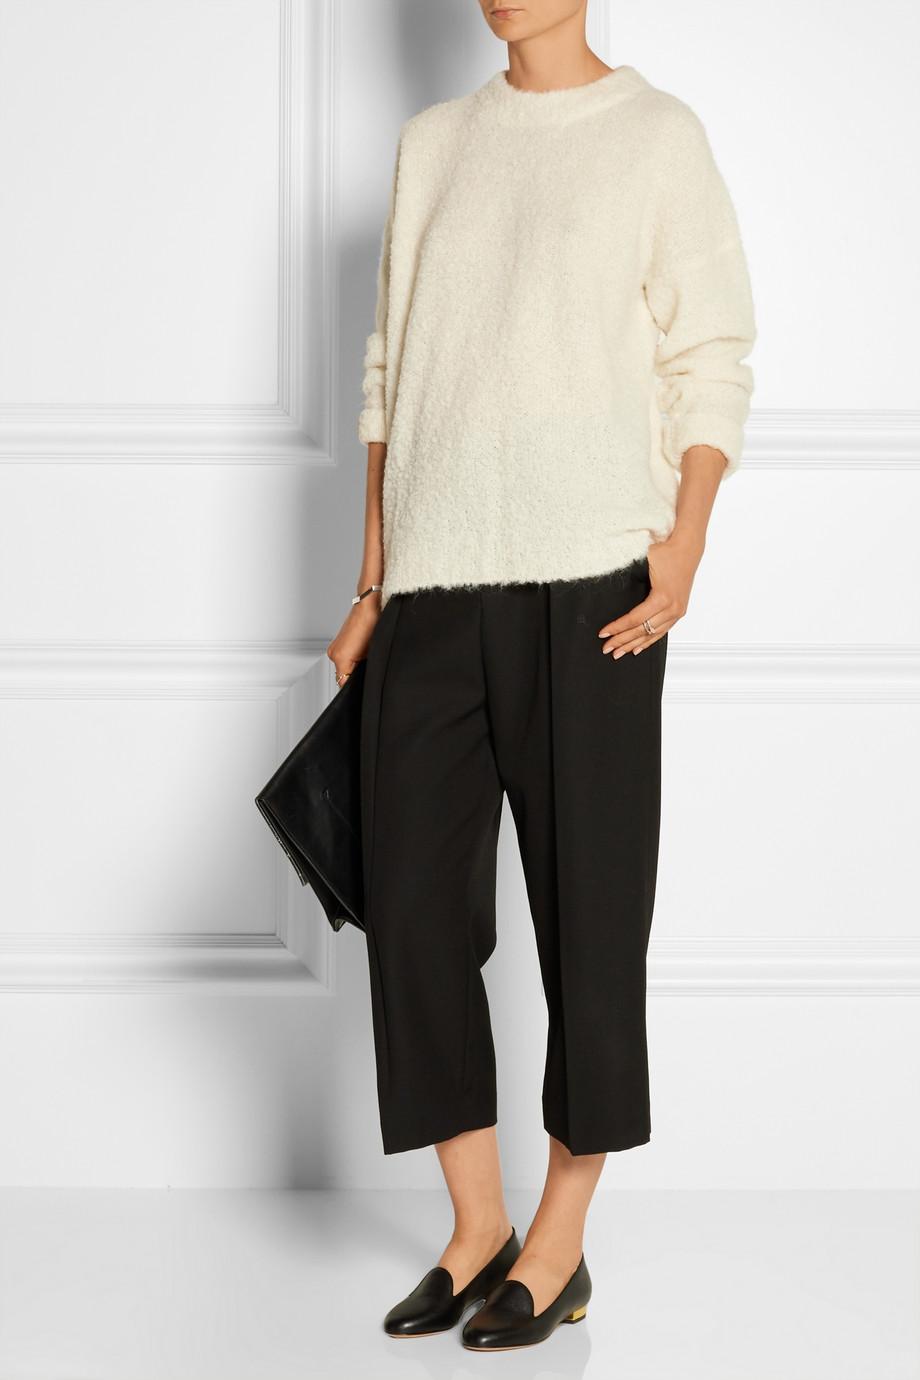 tibi knitwear 2